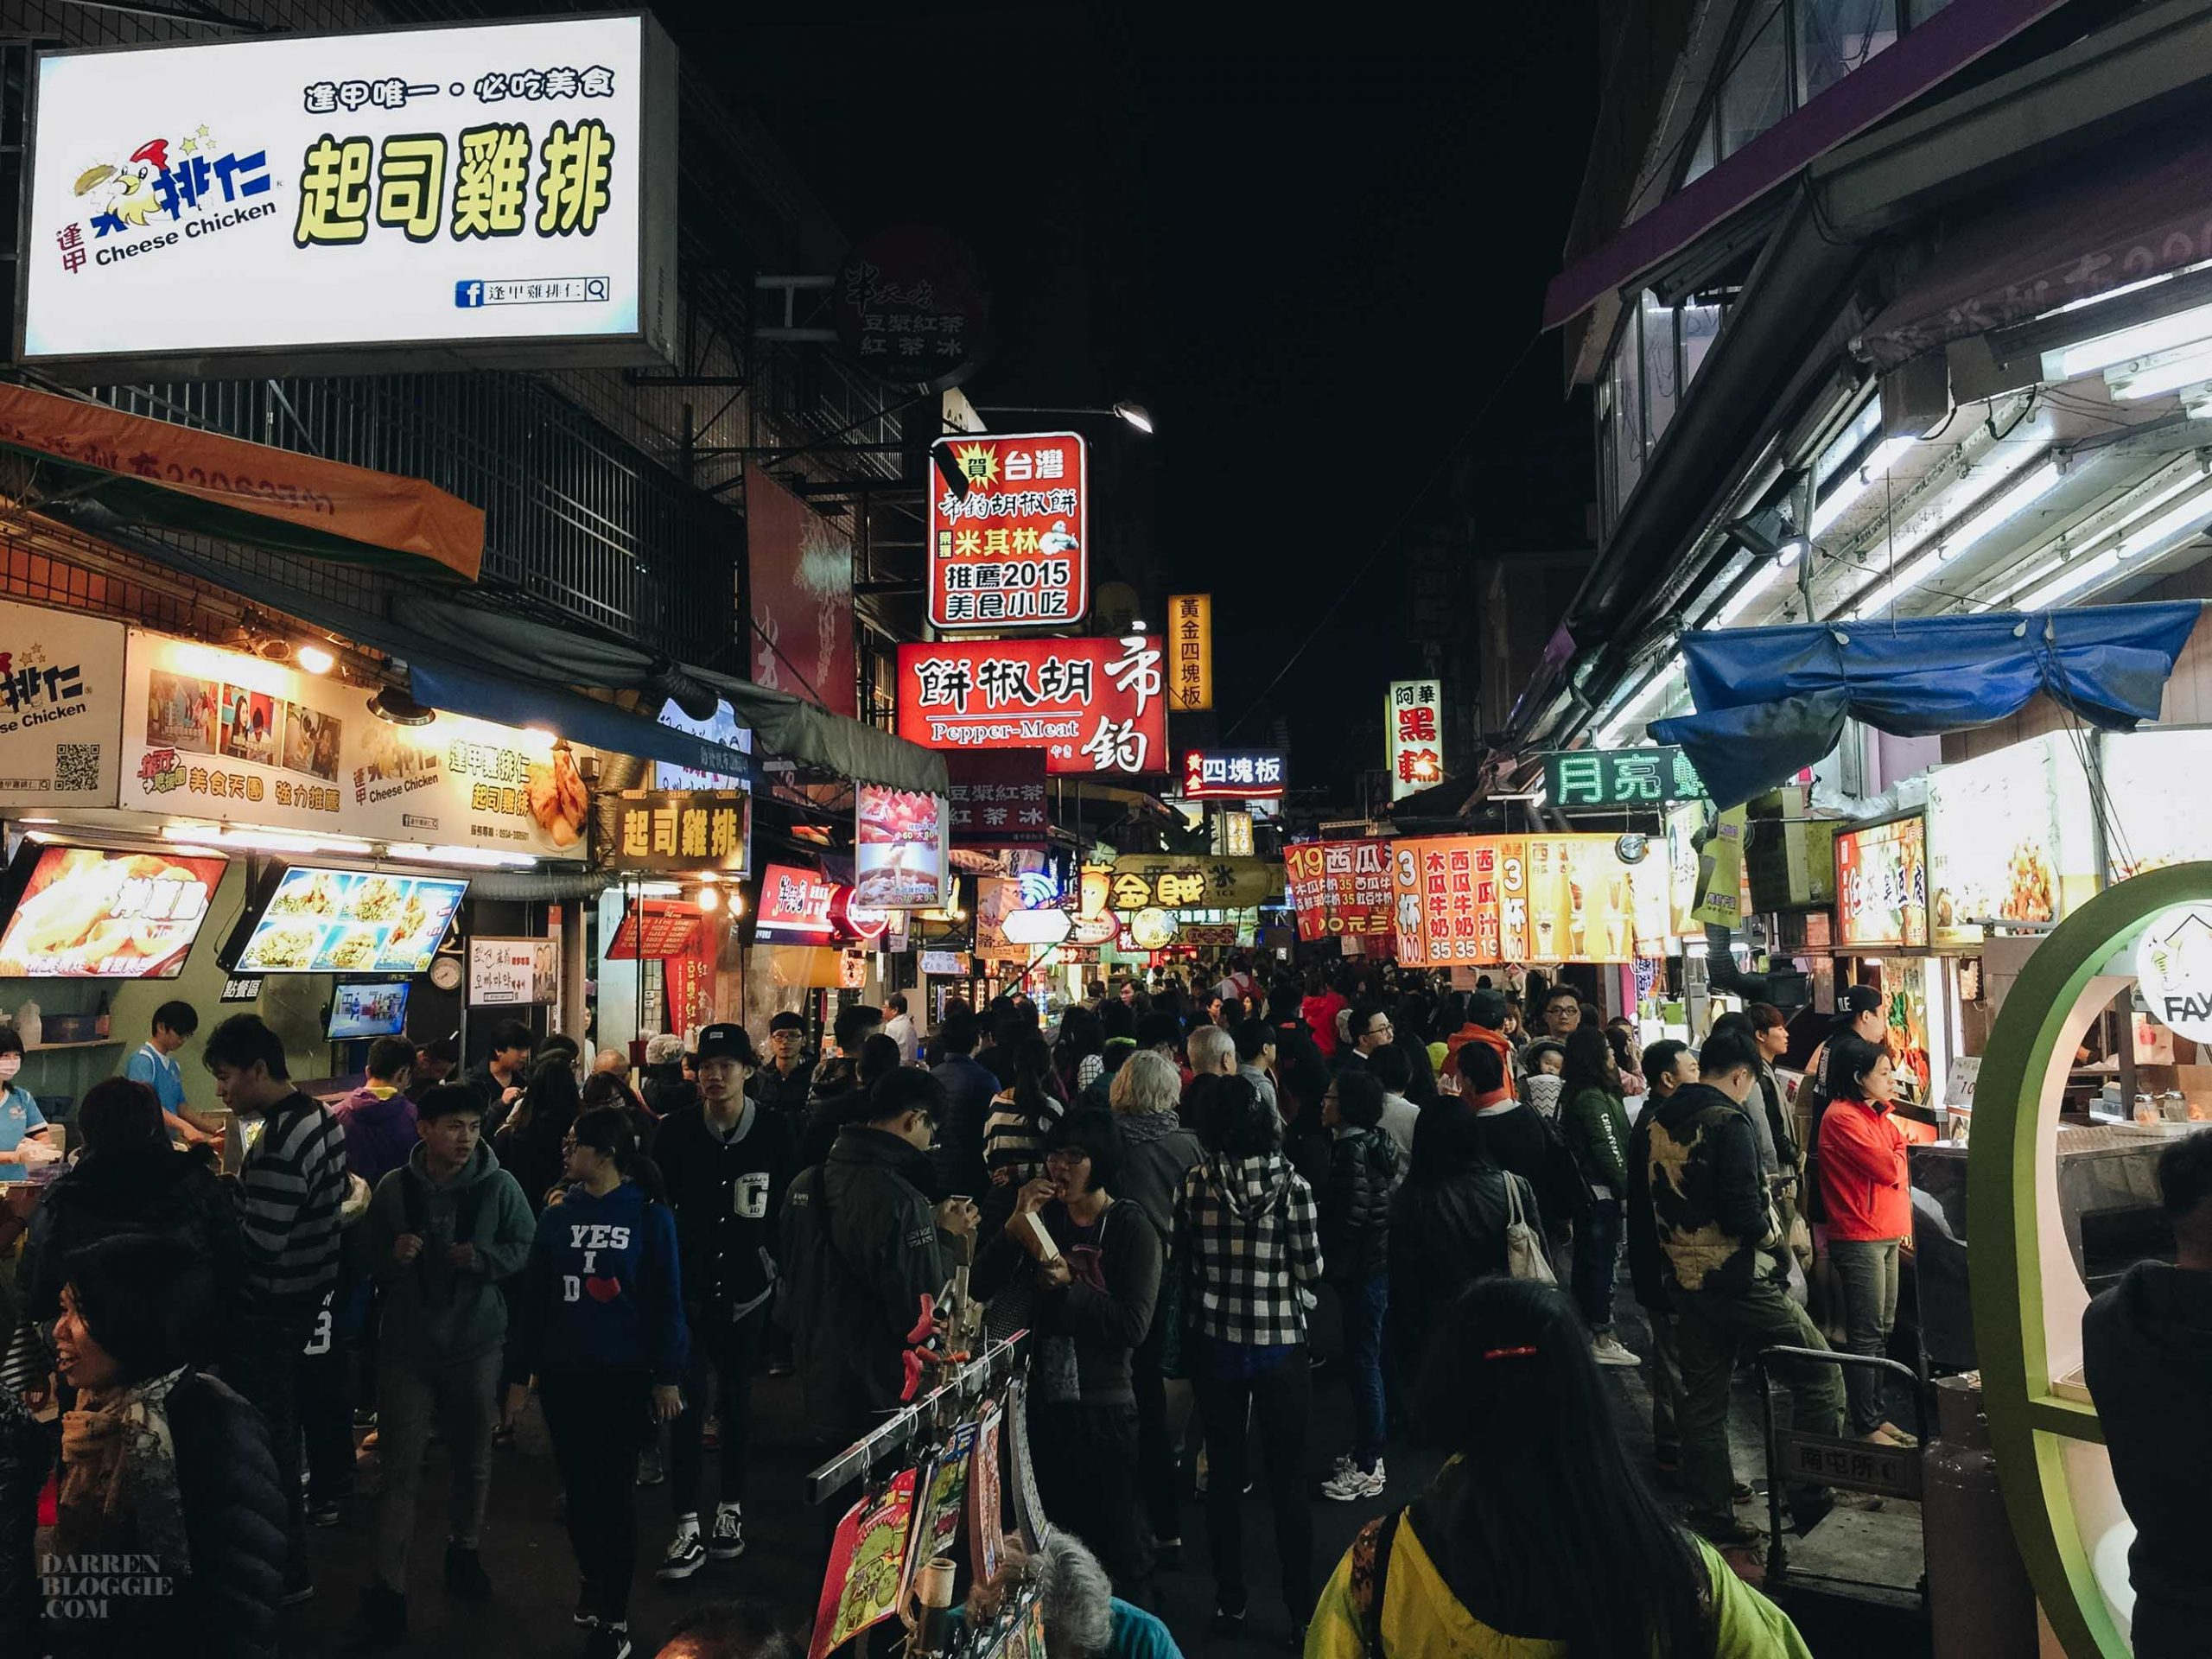 Fengjia Night Market in Taichung